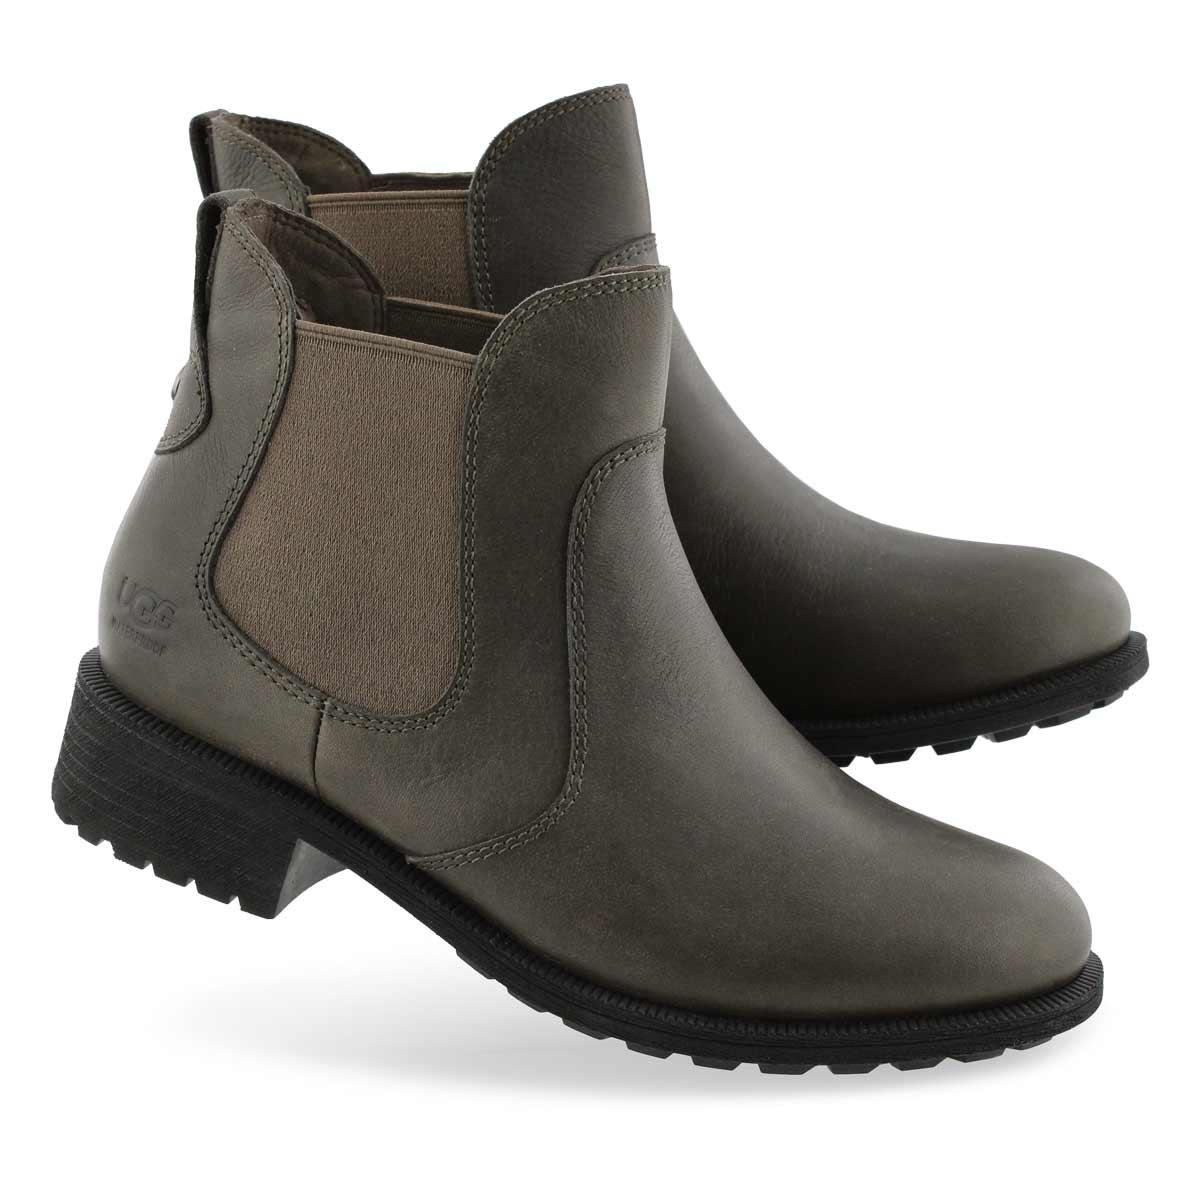 Women's Bonham III Waterproof Chelsea Boot - Slate